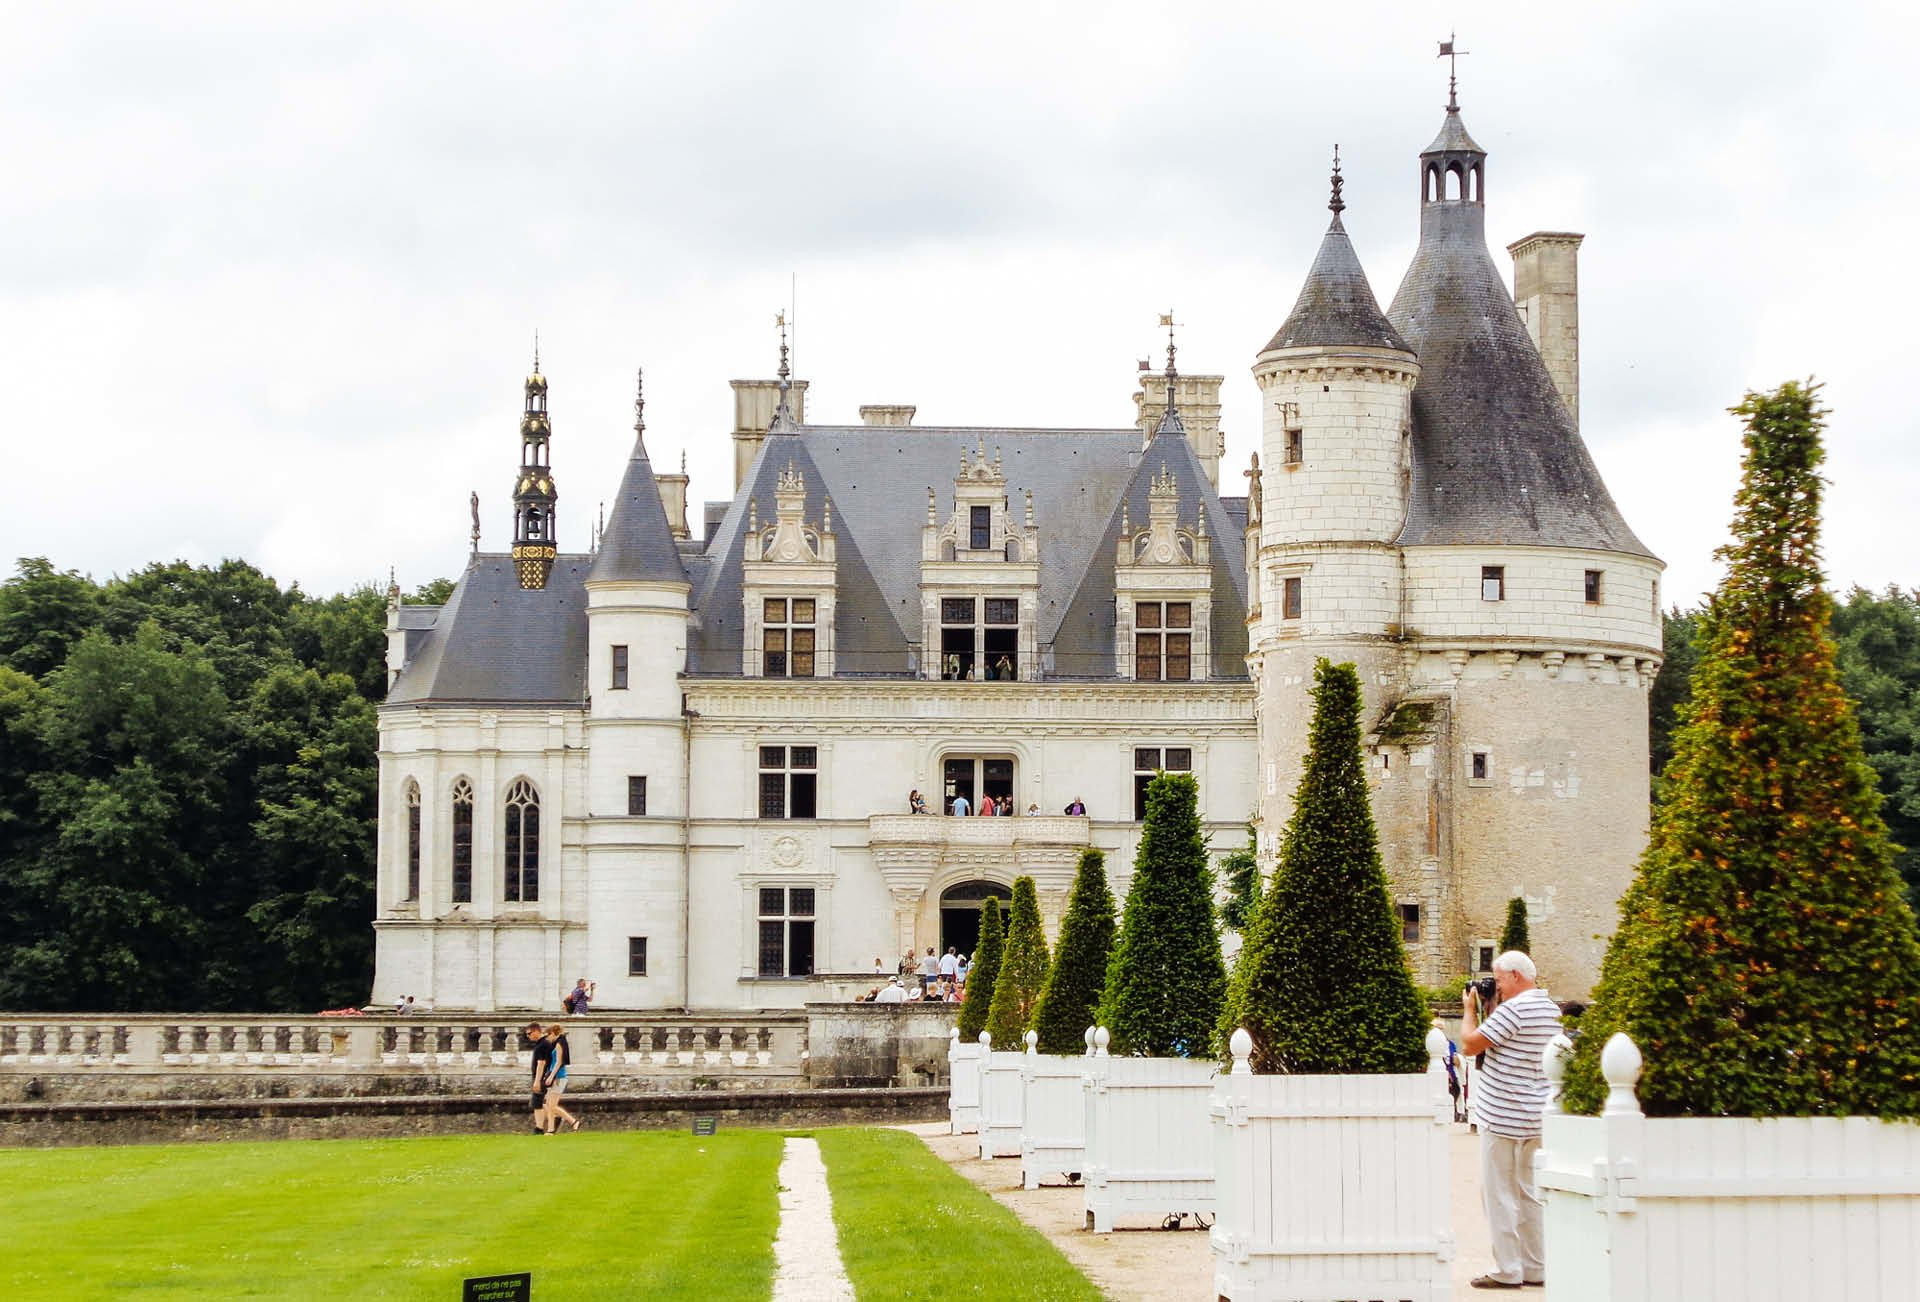 KURZTOUR Schlösser der Loire